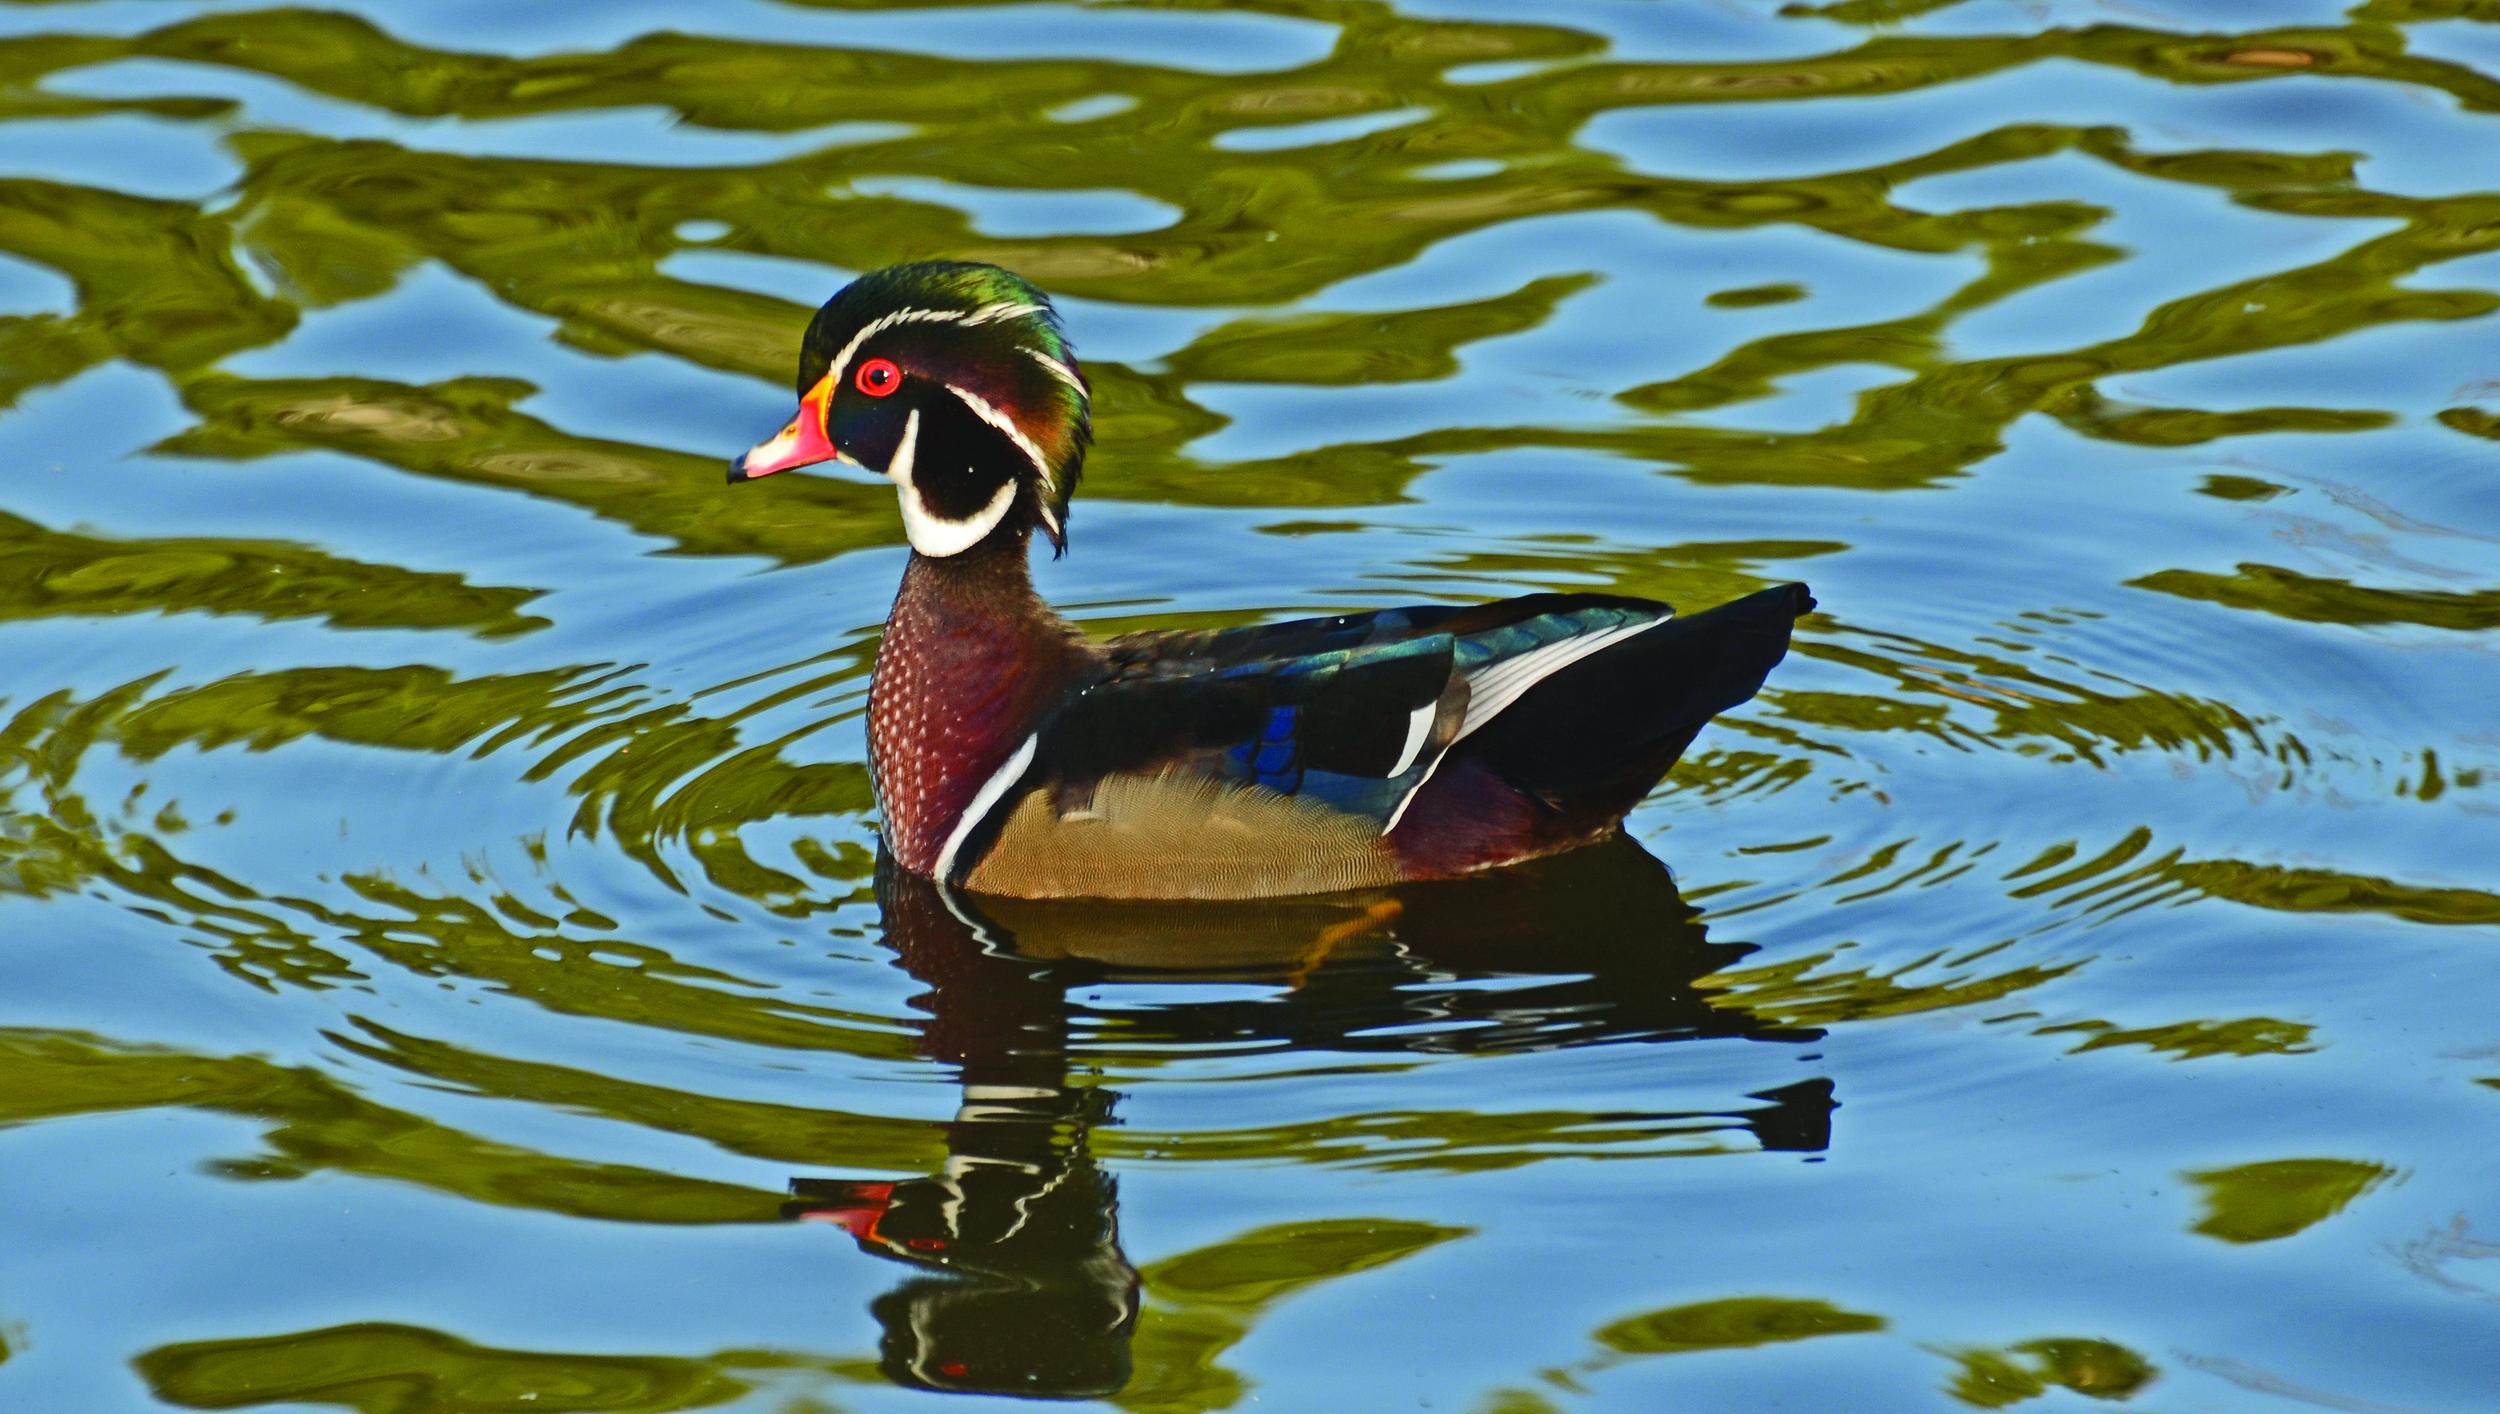 Wood Duck - Photo: Valls55